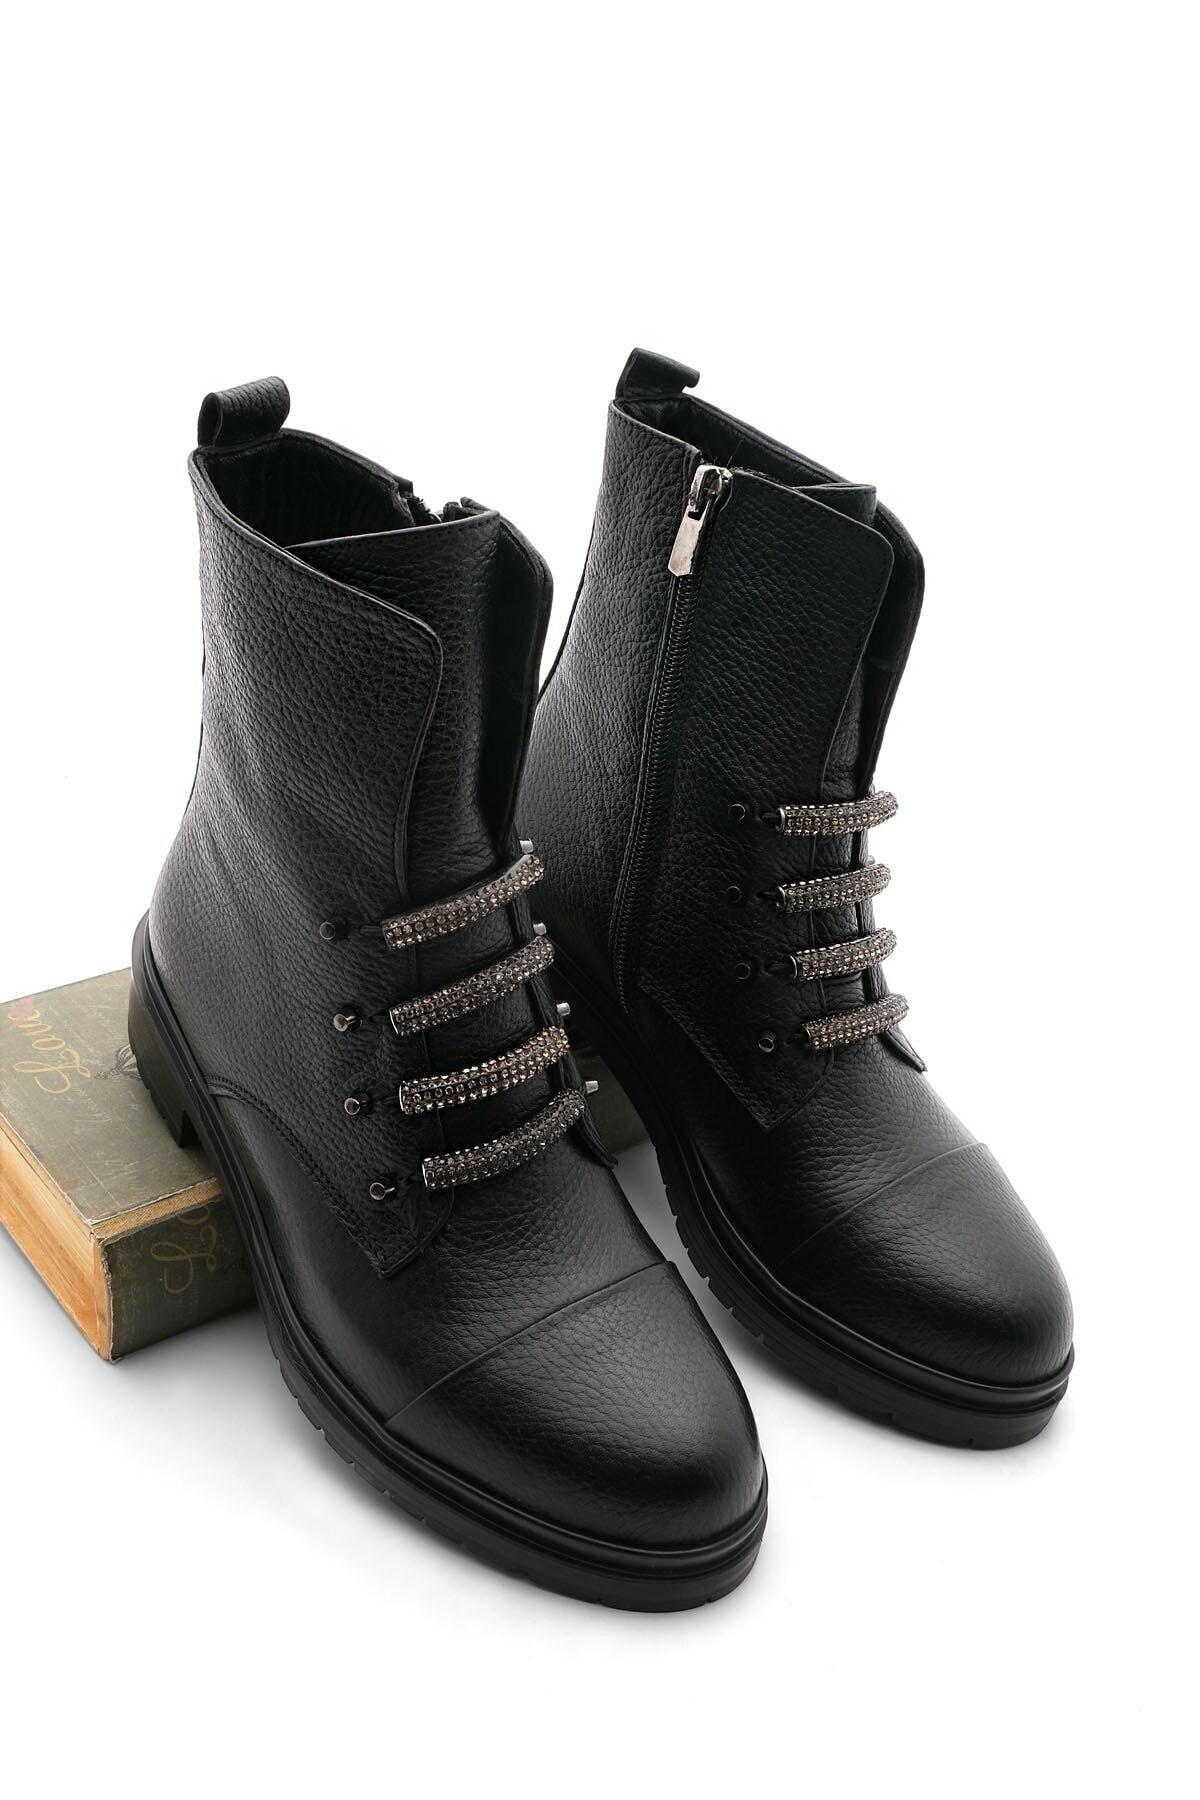 Women's boots Flat Bottom Genuine Leather Women Boots